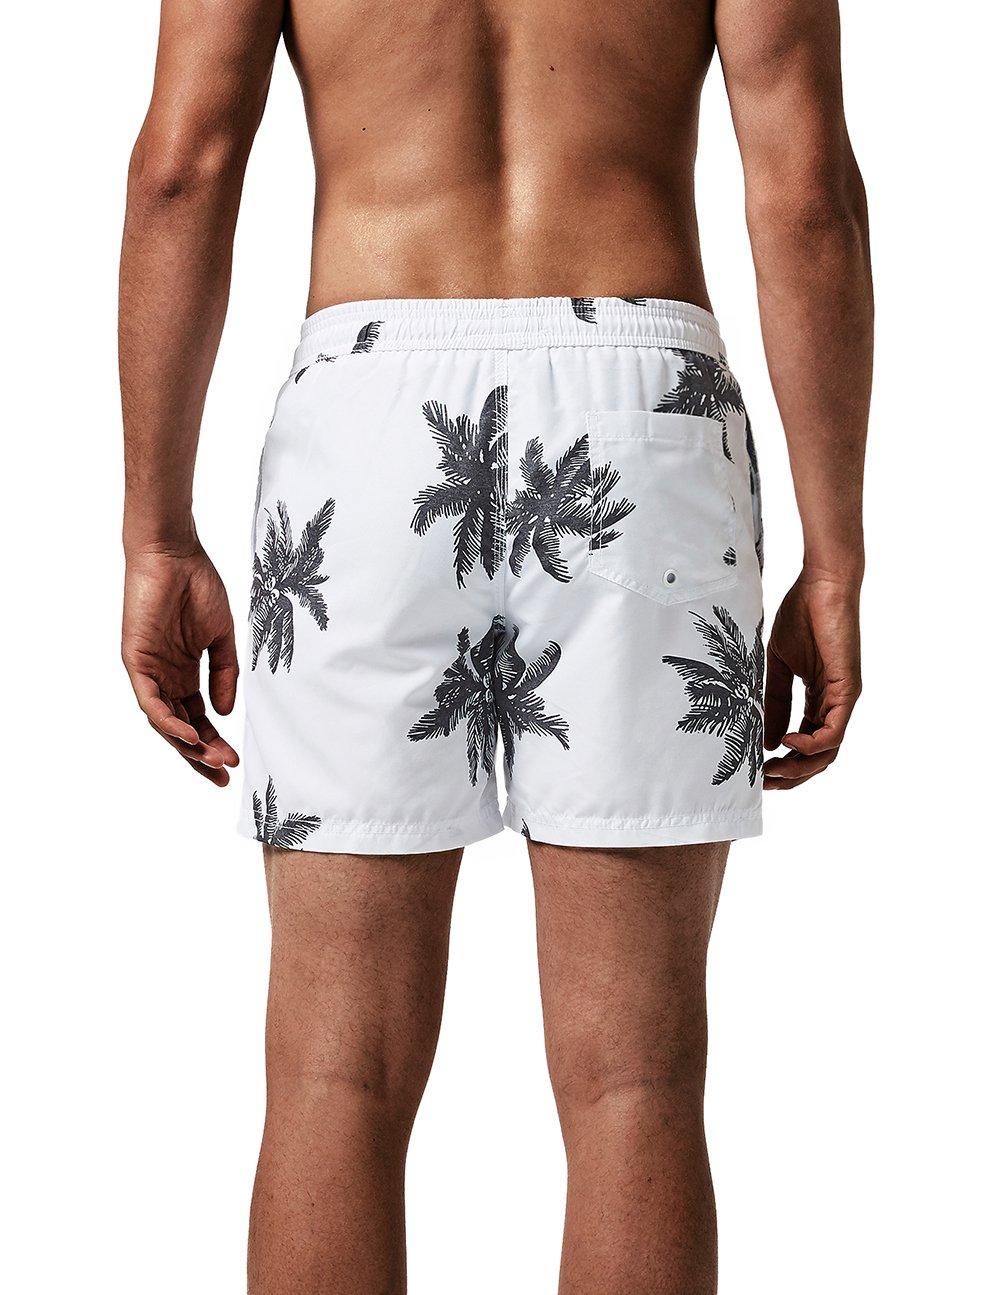 MaaMgic Uomo Costume da Bagno Nuoto Calzoncini Asciugatura Veloce per Spiaggia Mare Piscina 8 spesavip